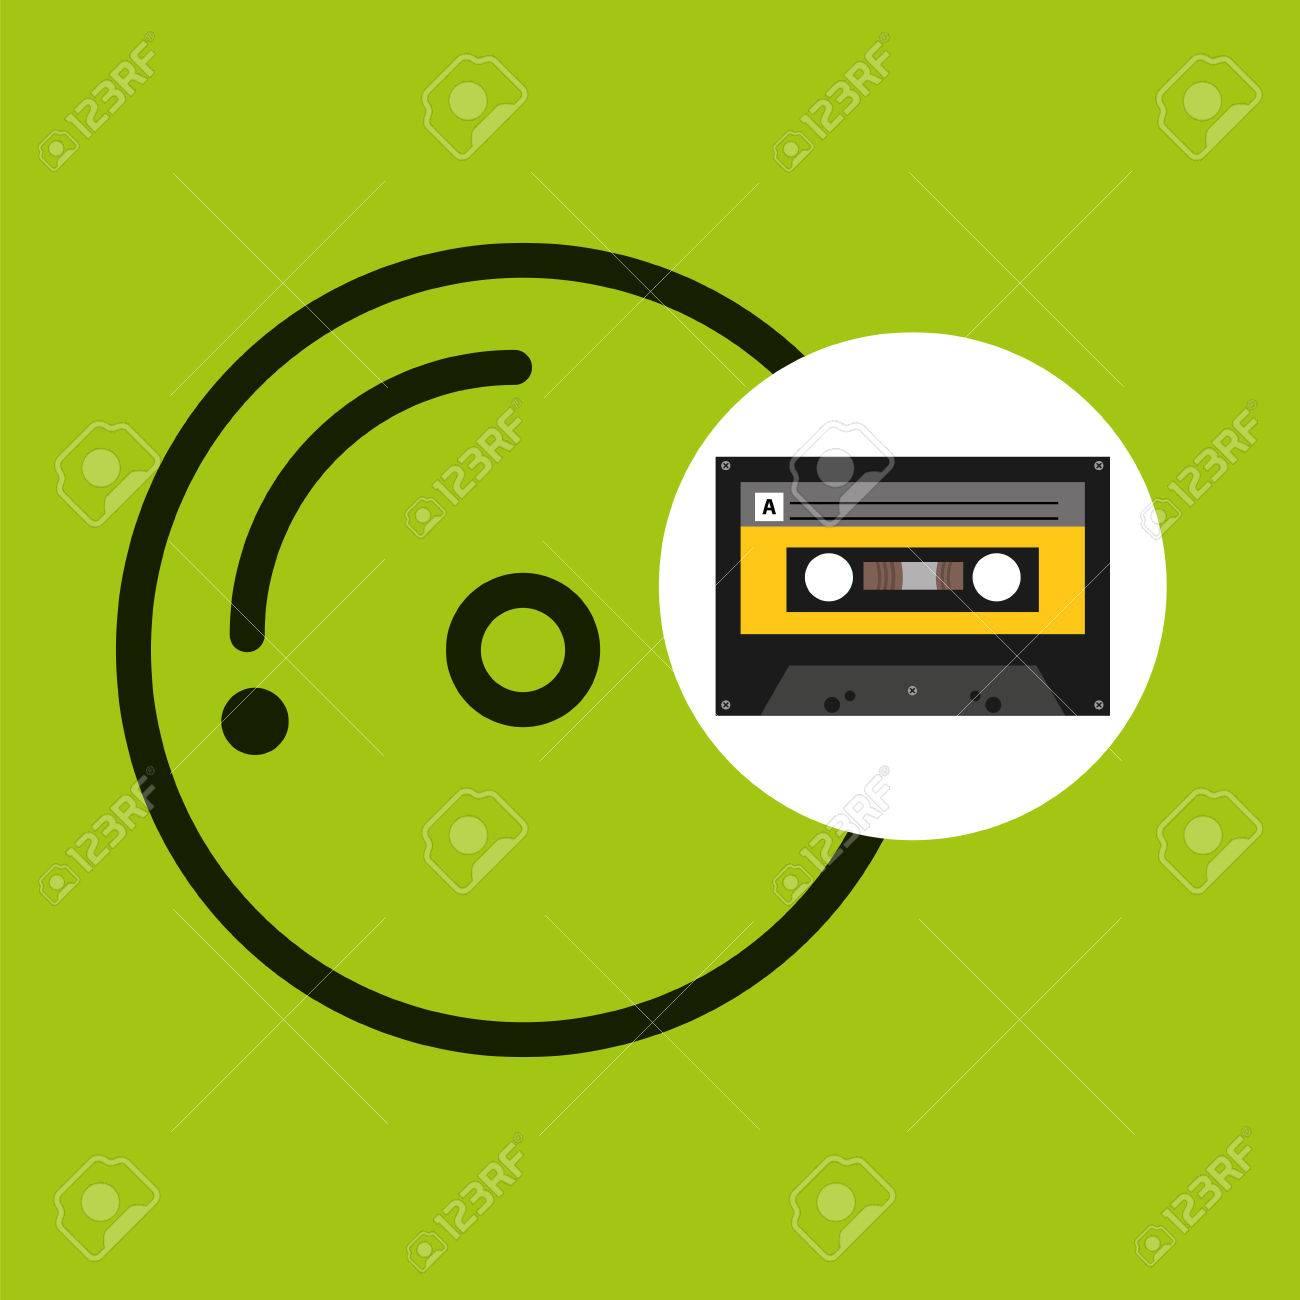 Cd コンパクトな音楽カセット テープ ベクトル イラスト Eps 10の